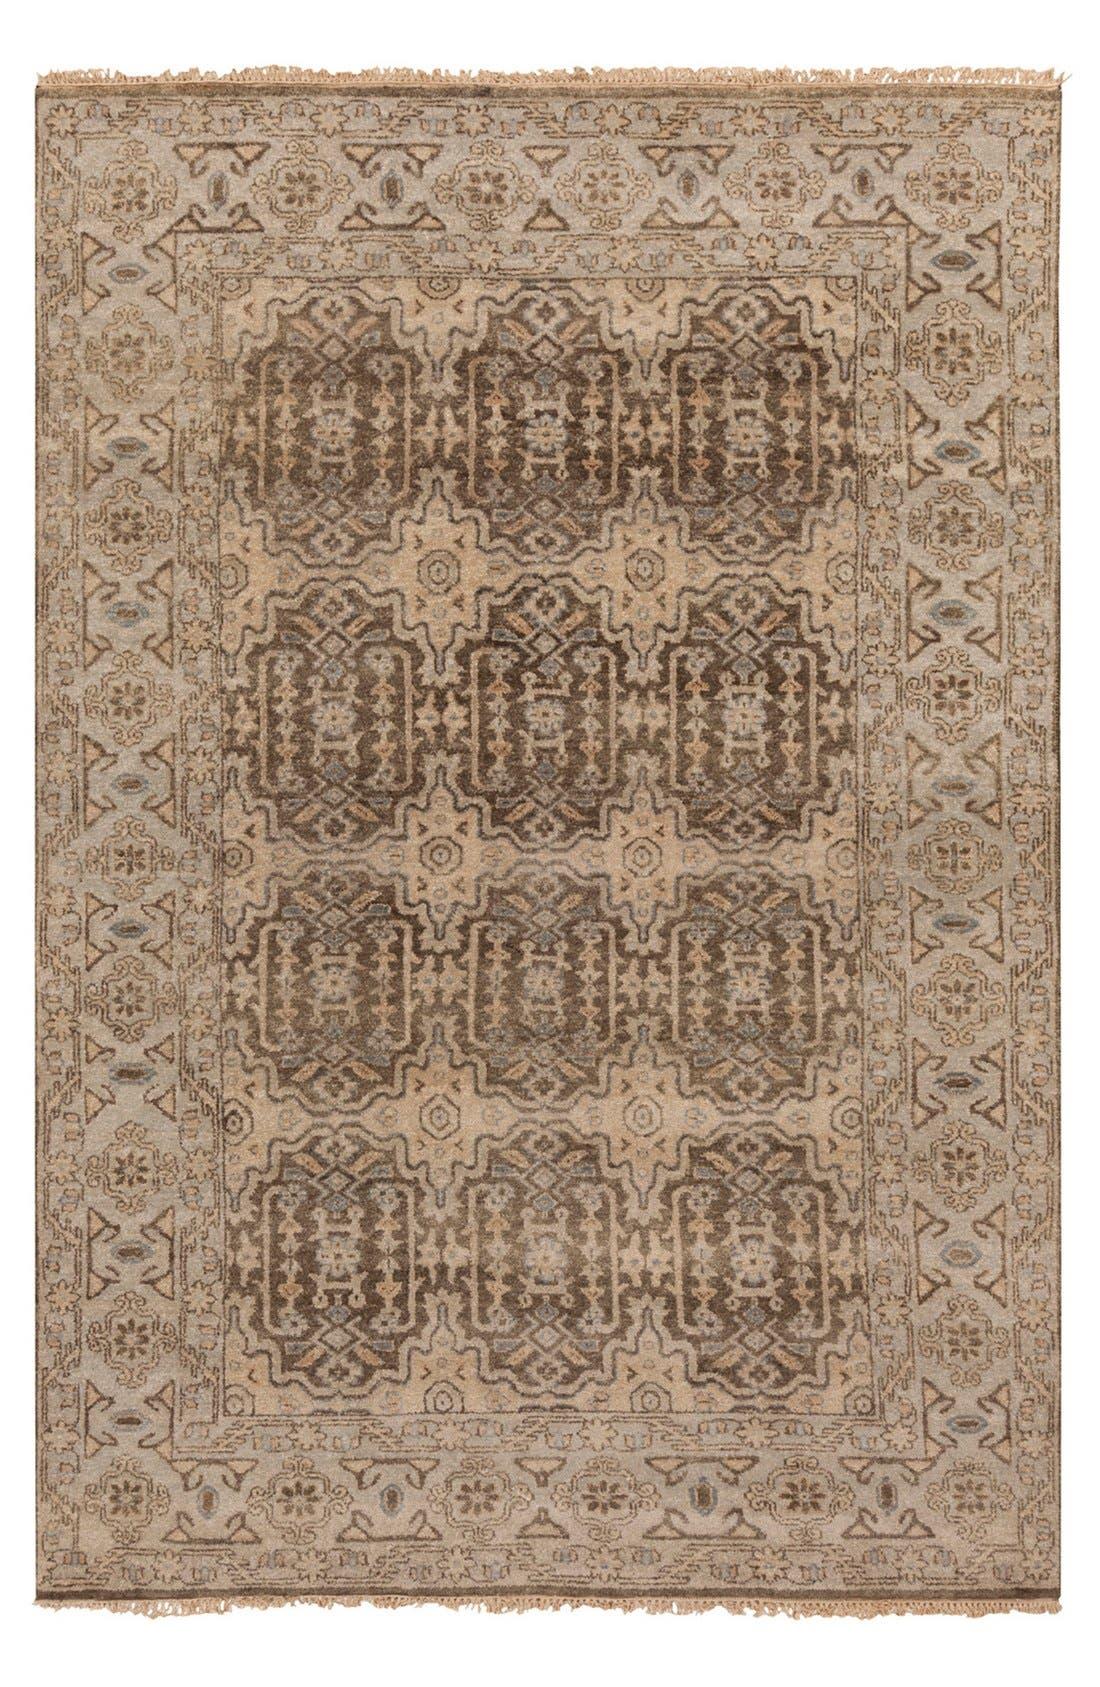 'Cheshire' Wool Rug,                             Main thumbnail 1, color,                             020